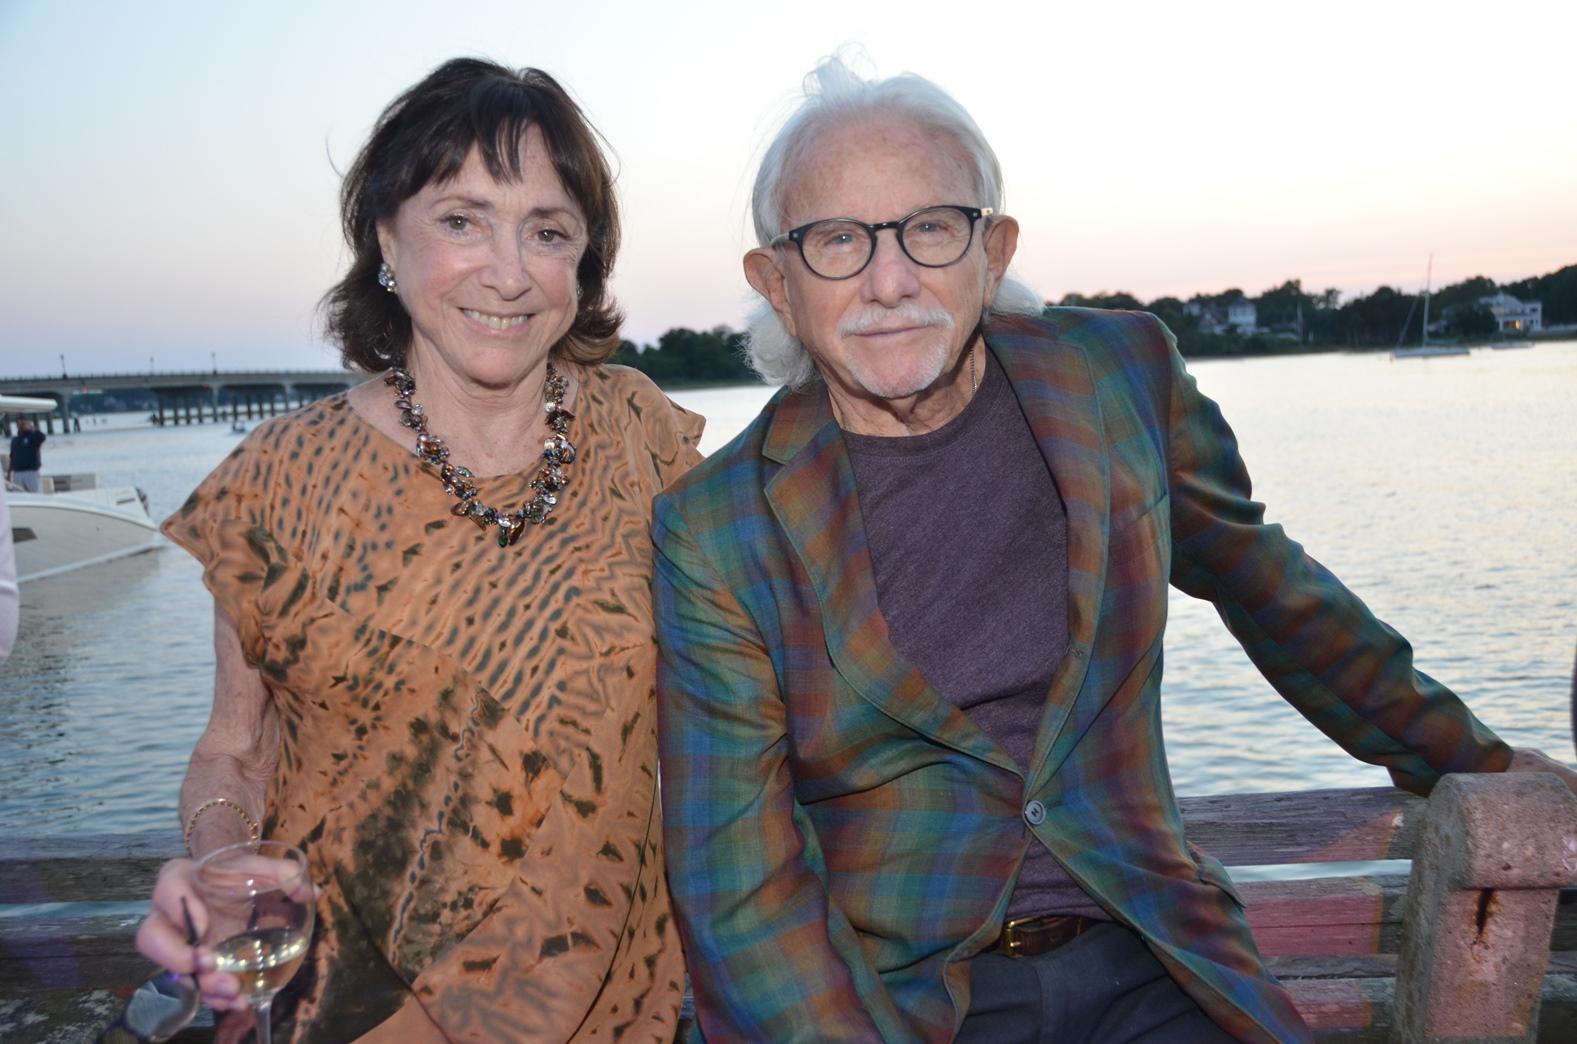 Ana Daniel with co-honoree Joe Pintauro (image: barry gordin)